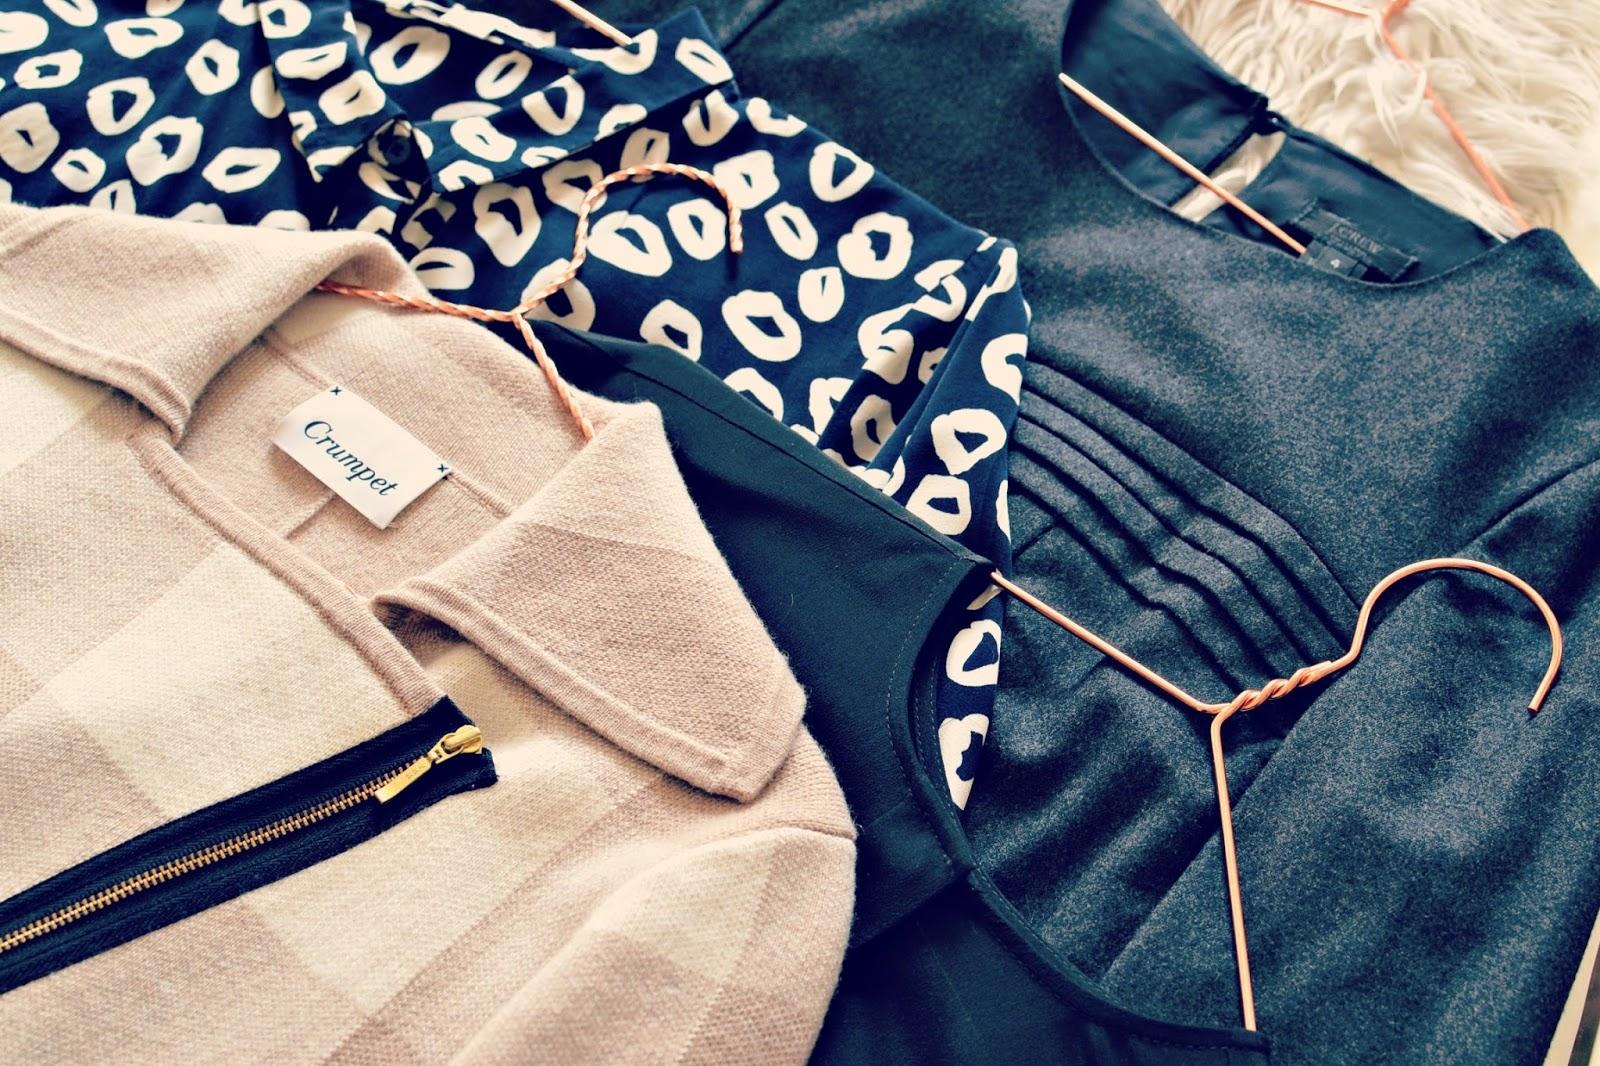 Crumpet cashmere biker jacket , Whistles loop print shirt, J Crew woolen top, Topshop boutique silk boxy top